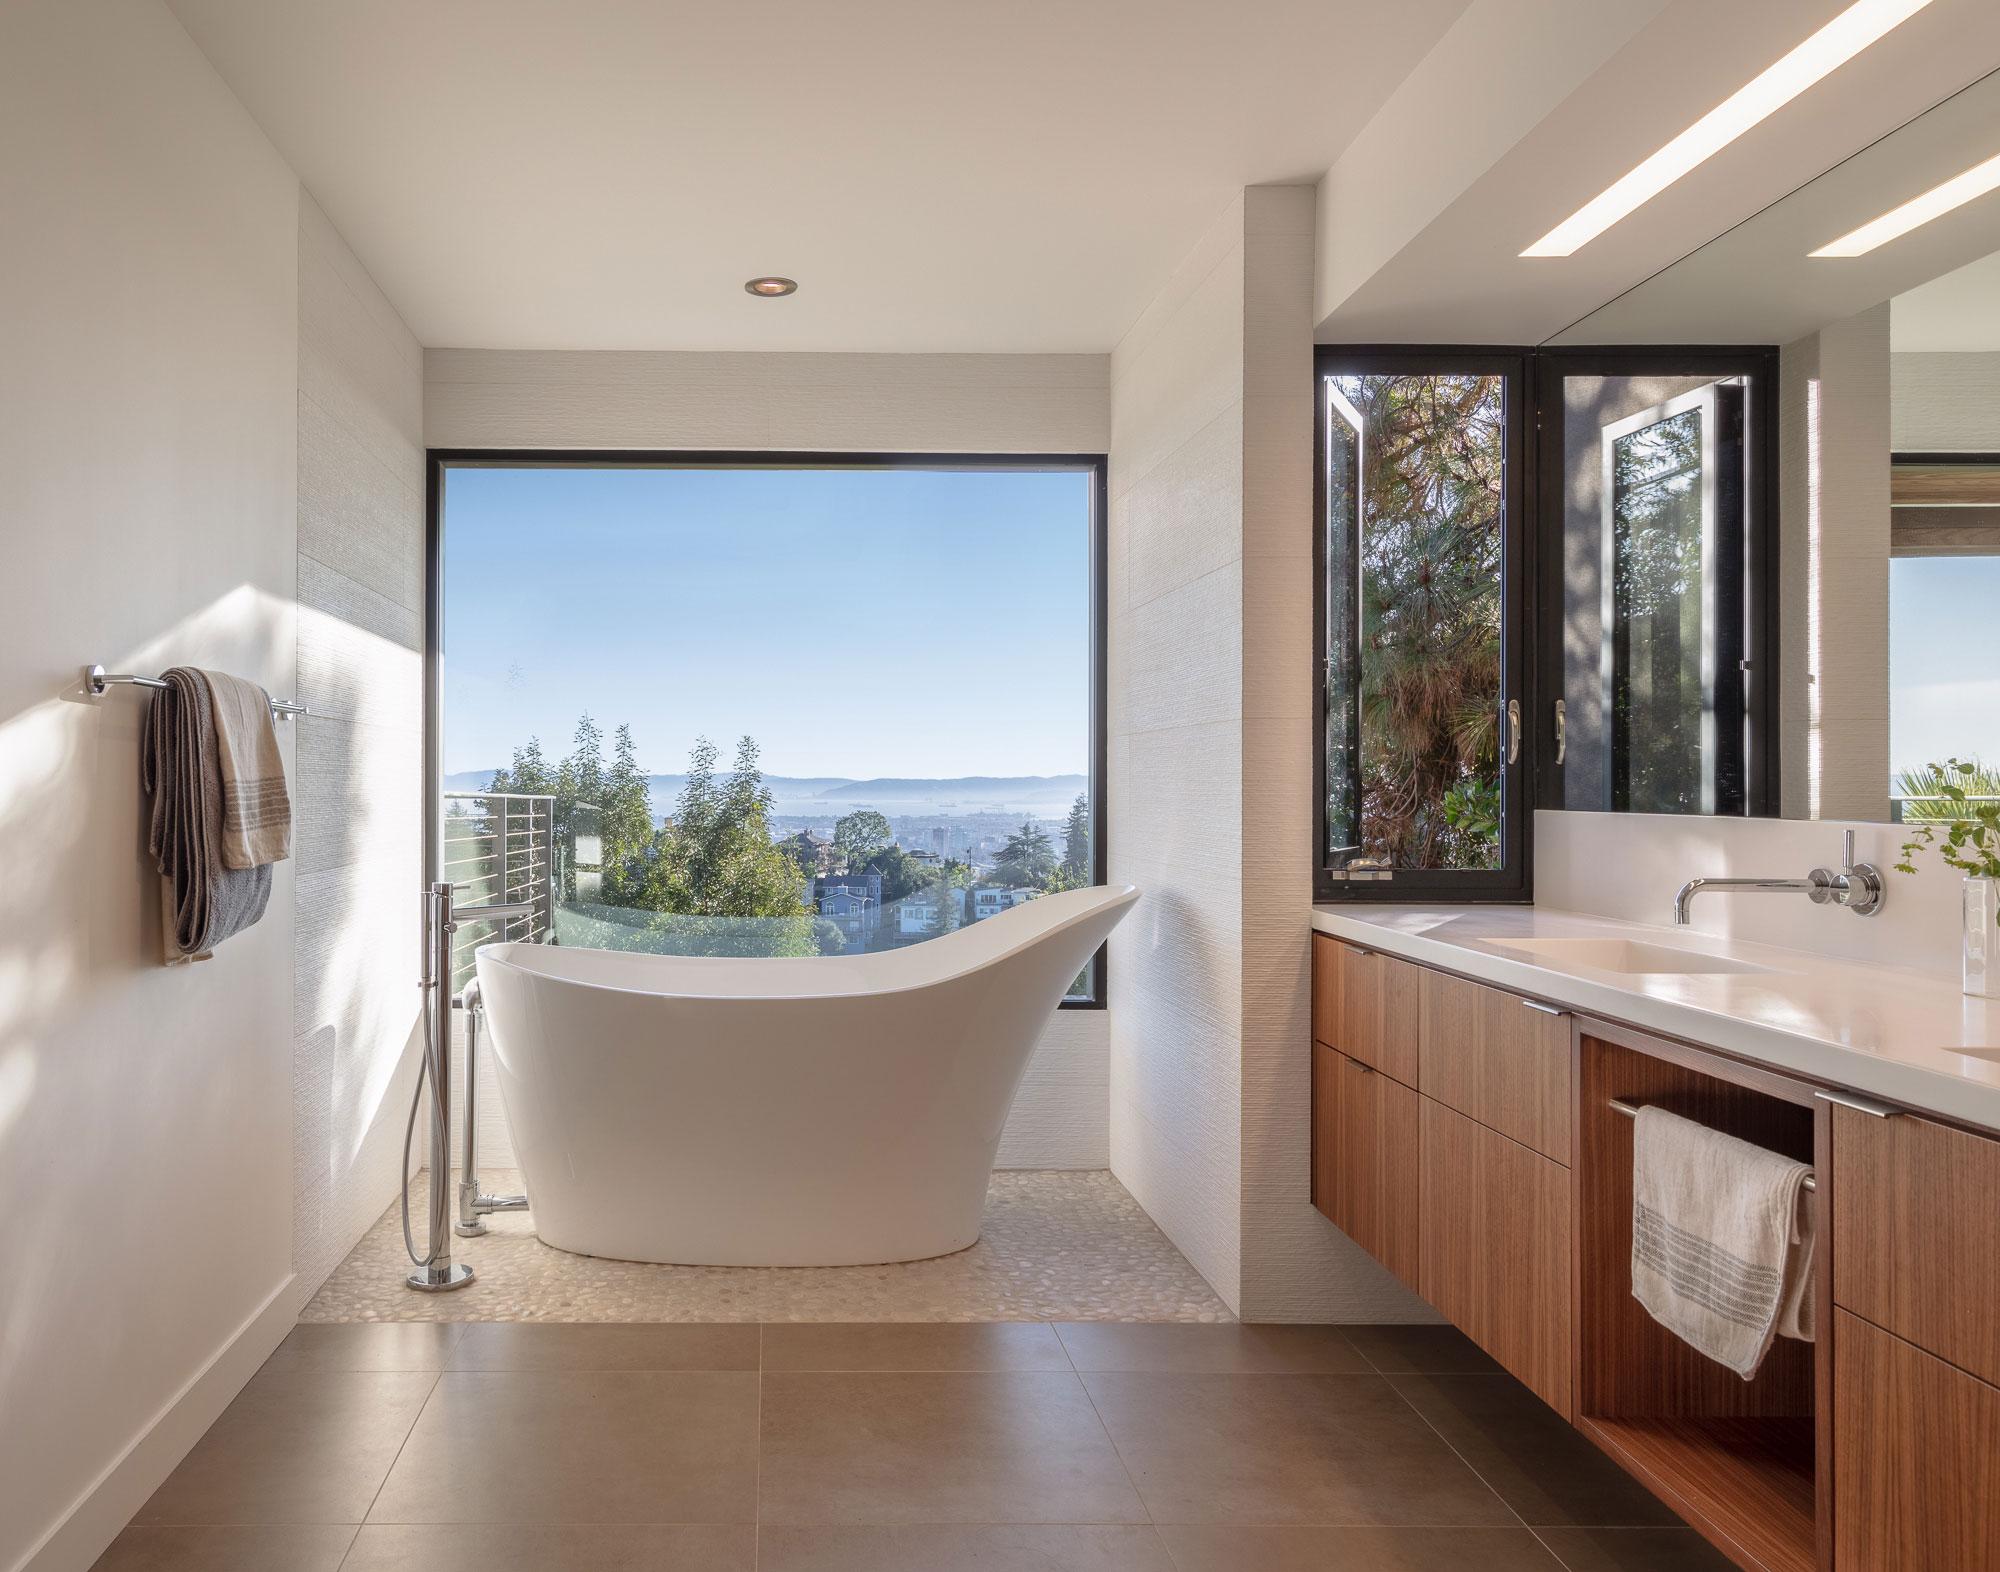 Piedmont HIllside Master Bath Tub with View Buestad Construction